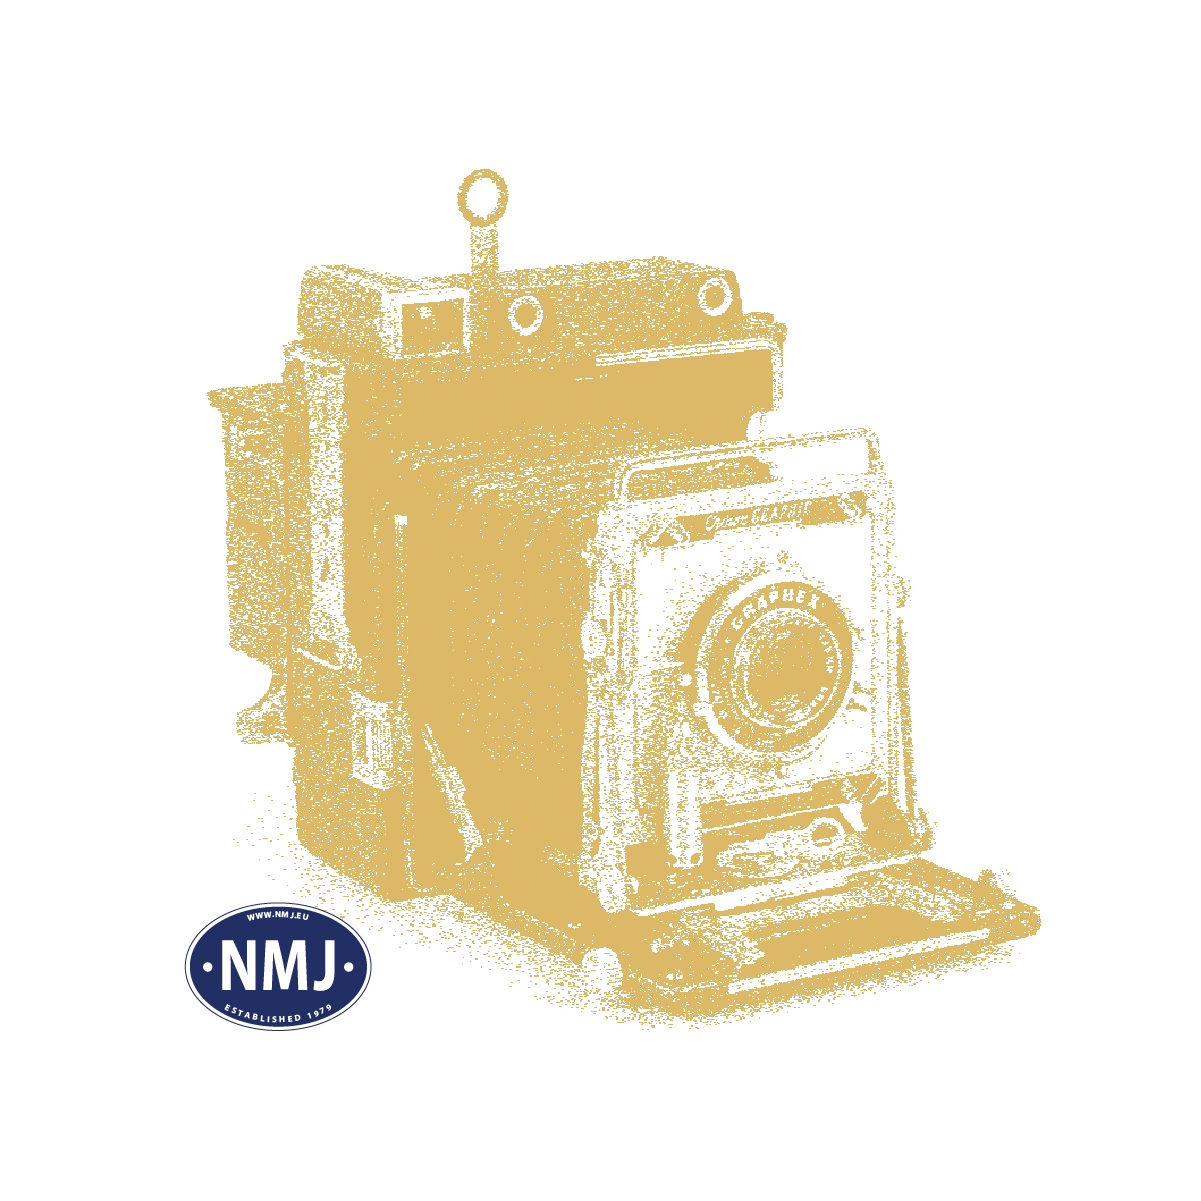 NMJT506.201 - NMJ Topline NSB Gbs 150 0 058-5